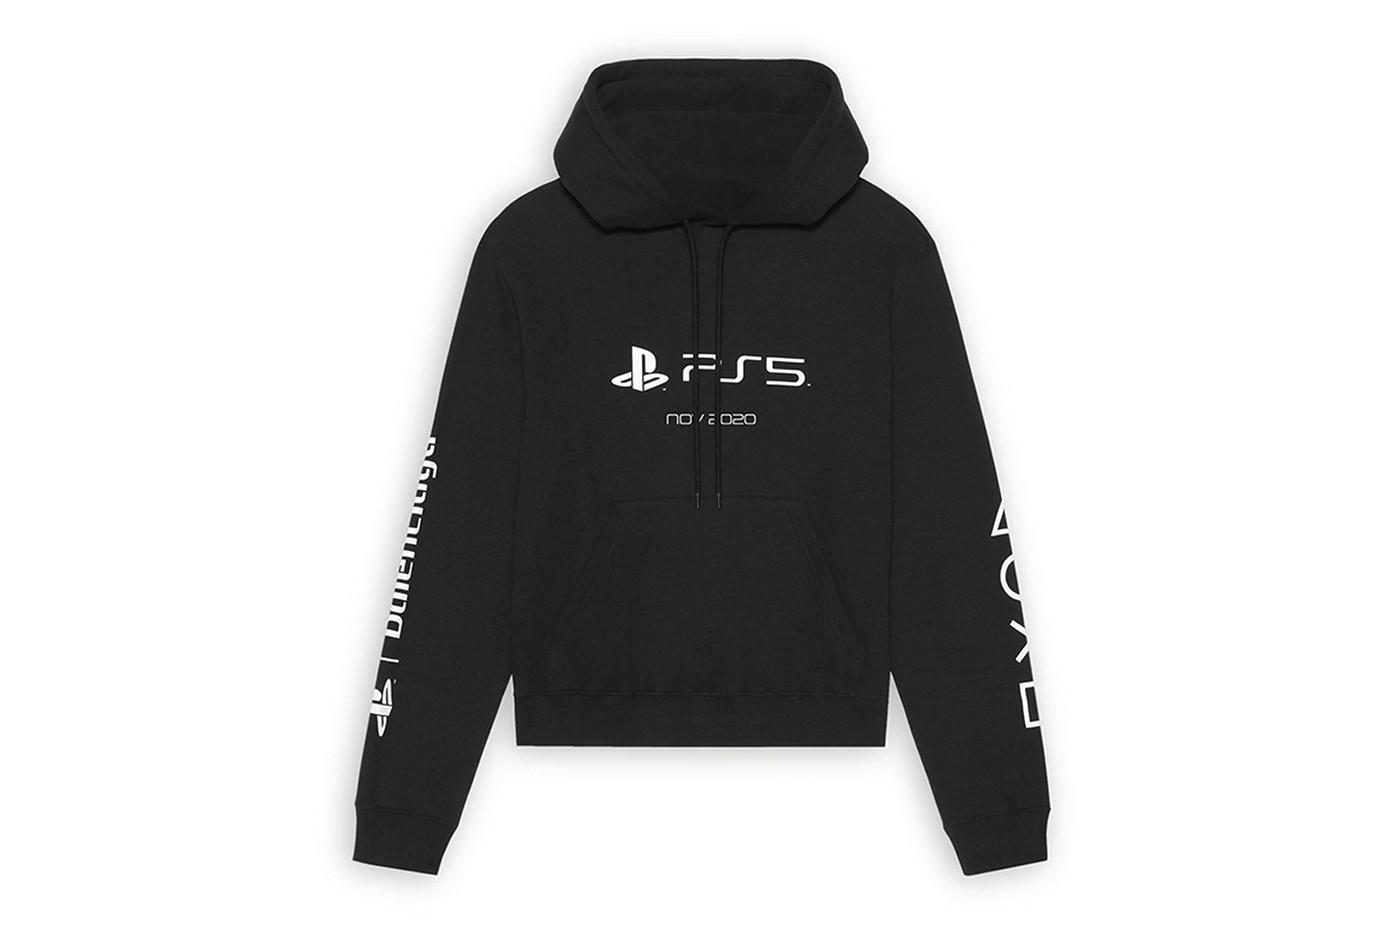 Balenciaga Sony PlayStation 5 Capsule<